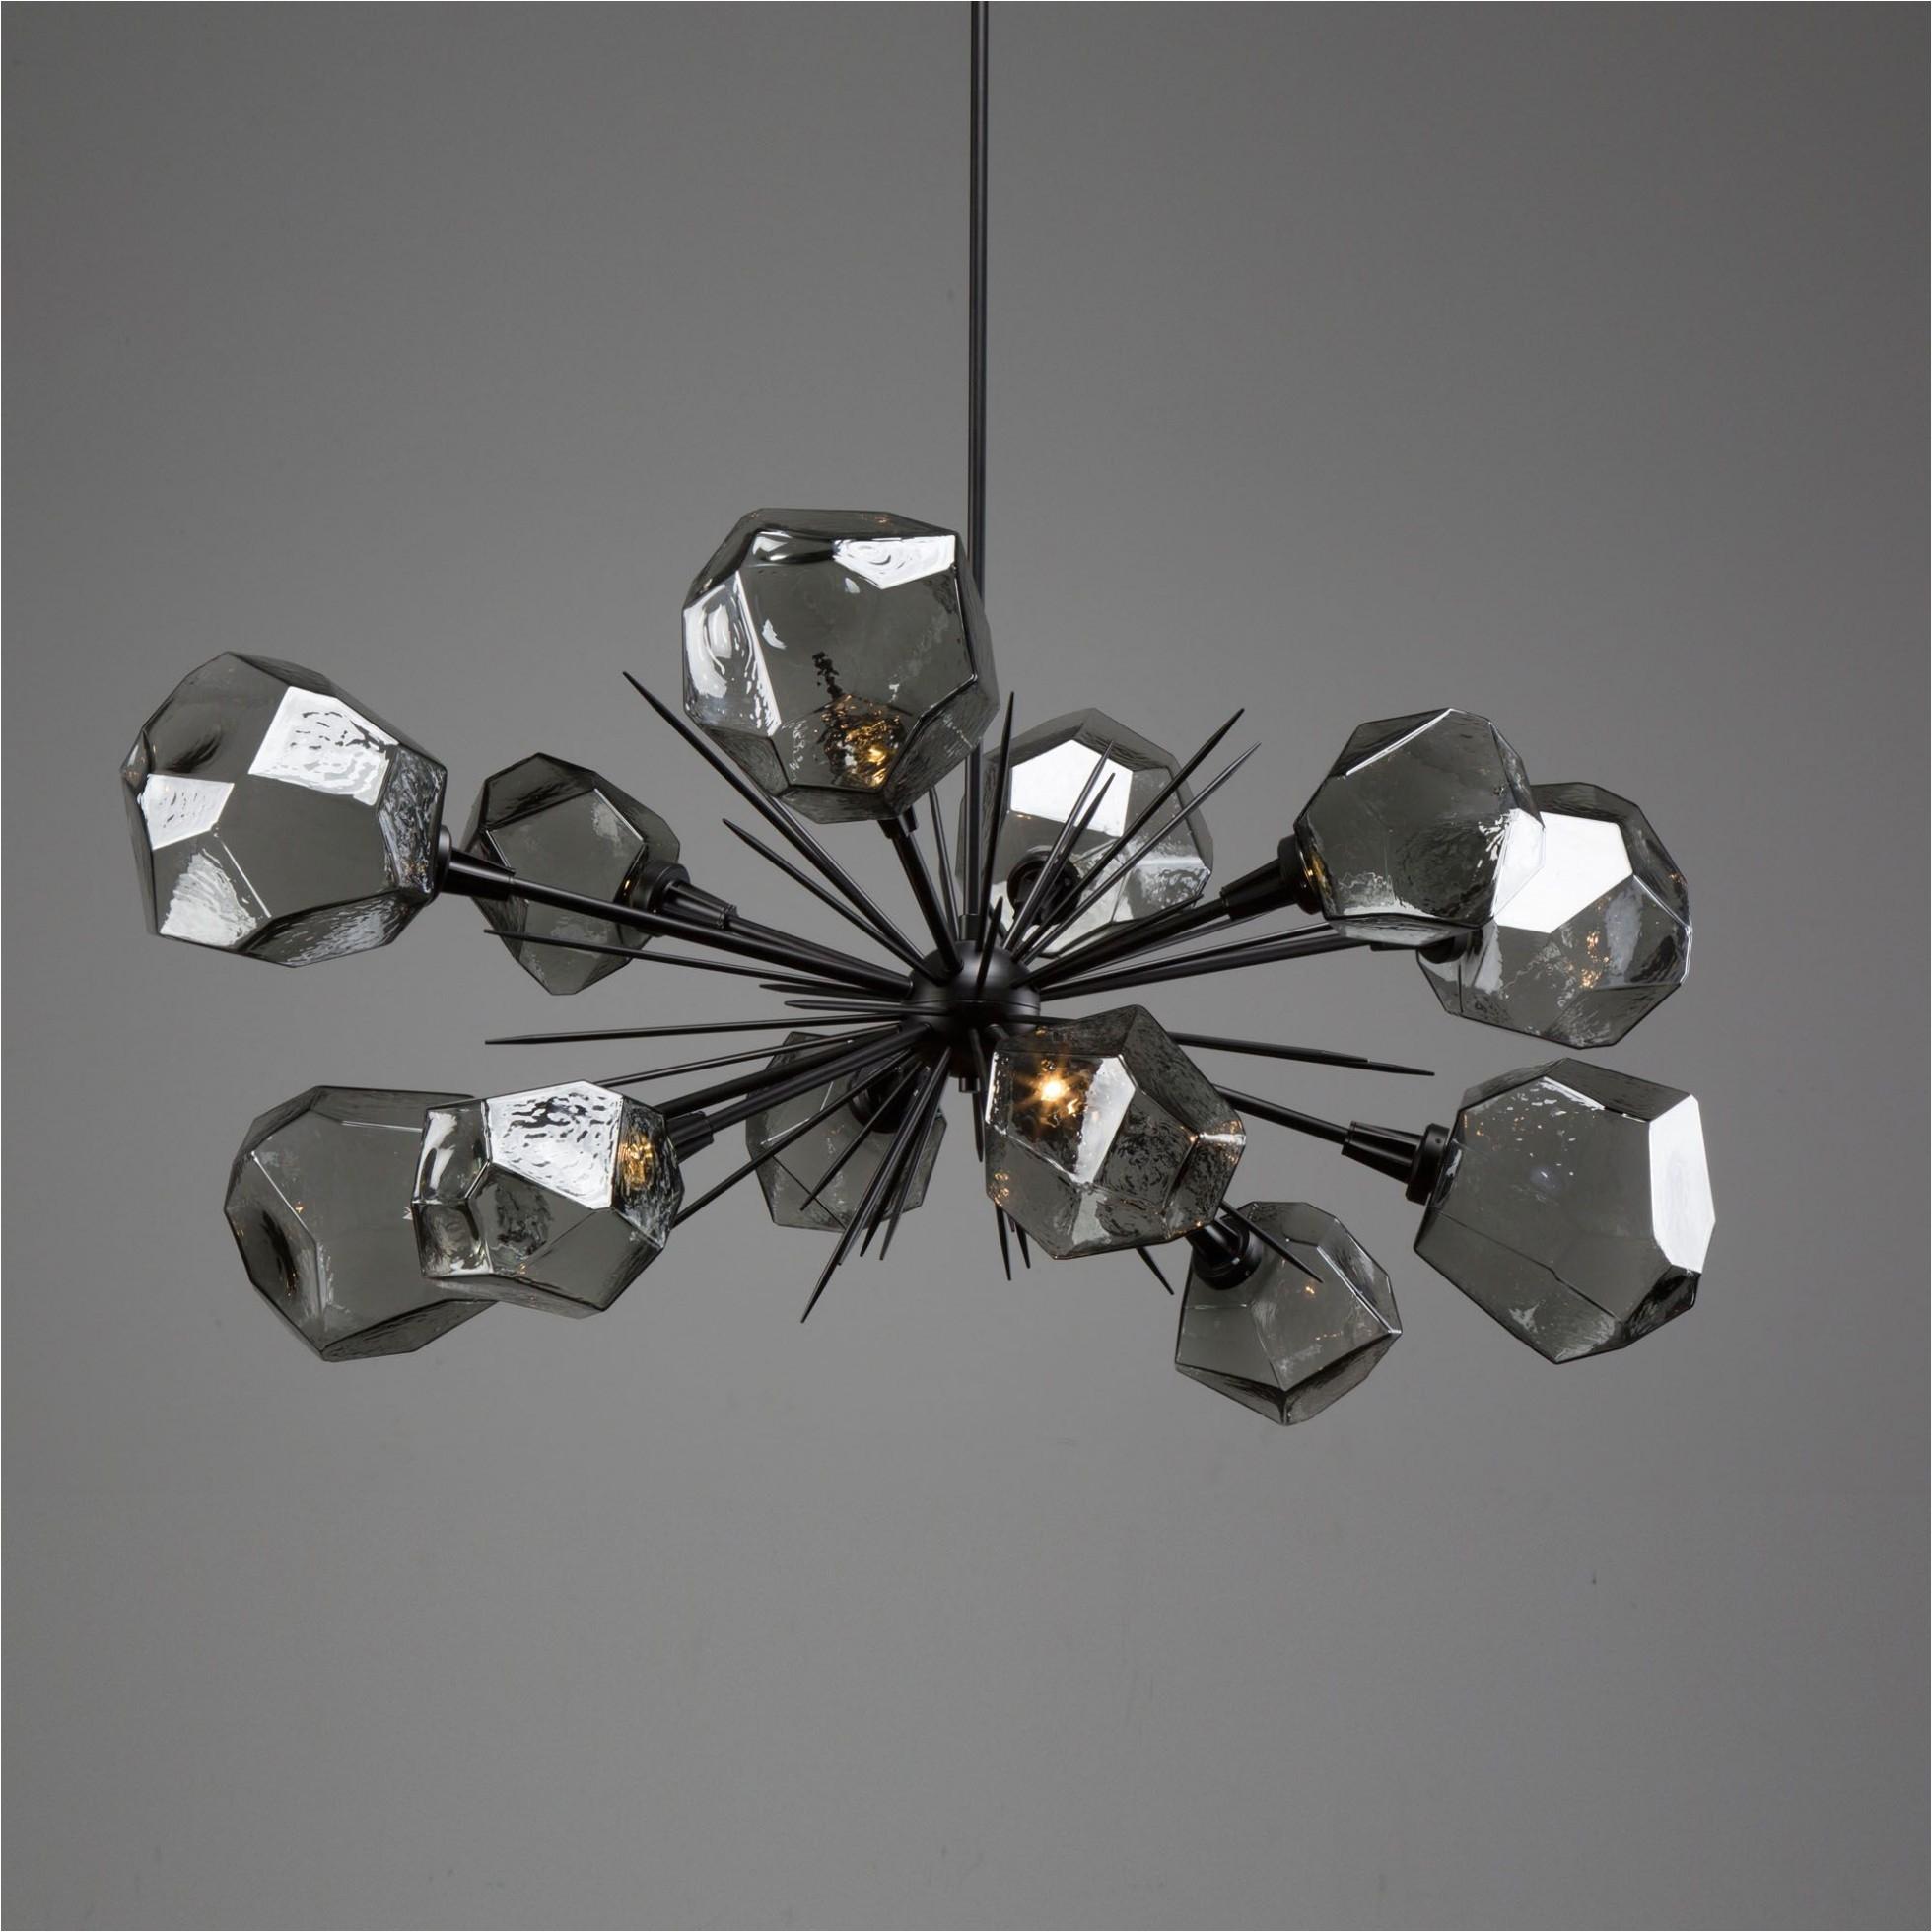 modern crystal chandeliers luxury gem oval starburst chandelier plb0039 0d foothillfolk designs of modern crystal chandeliers